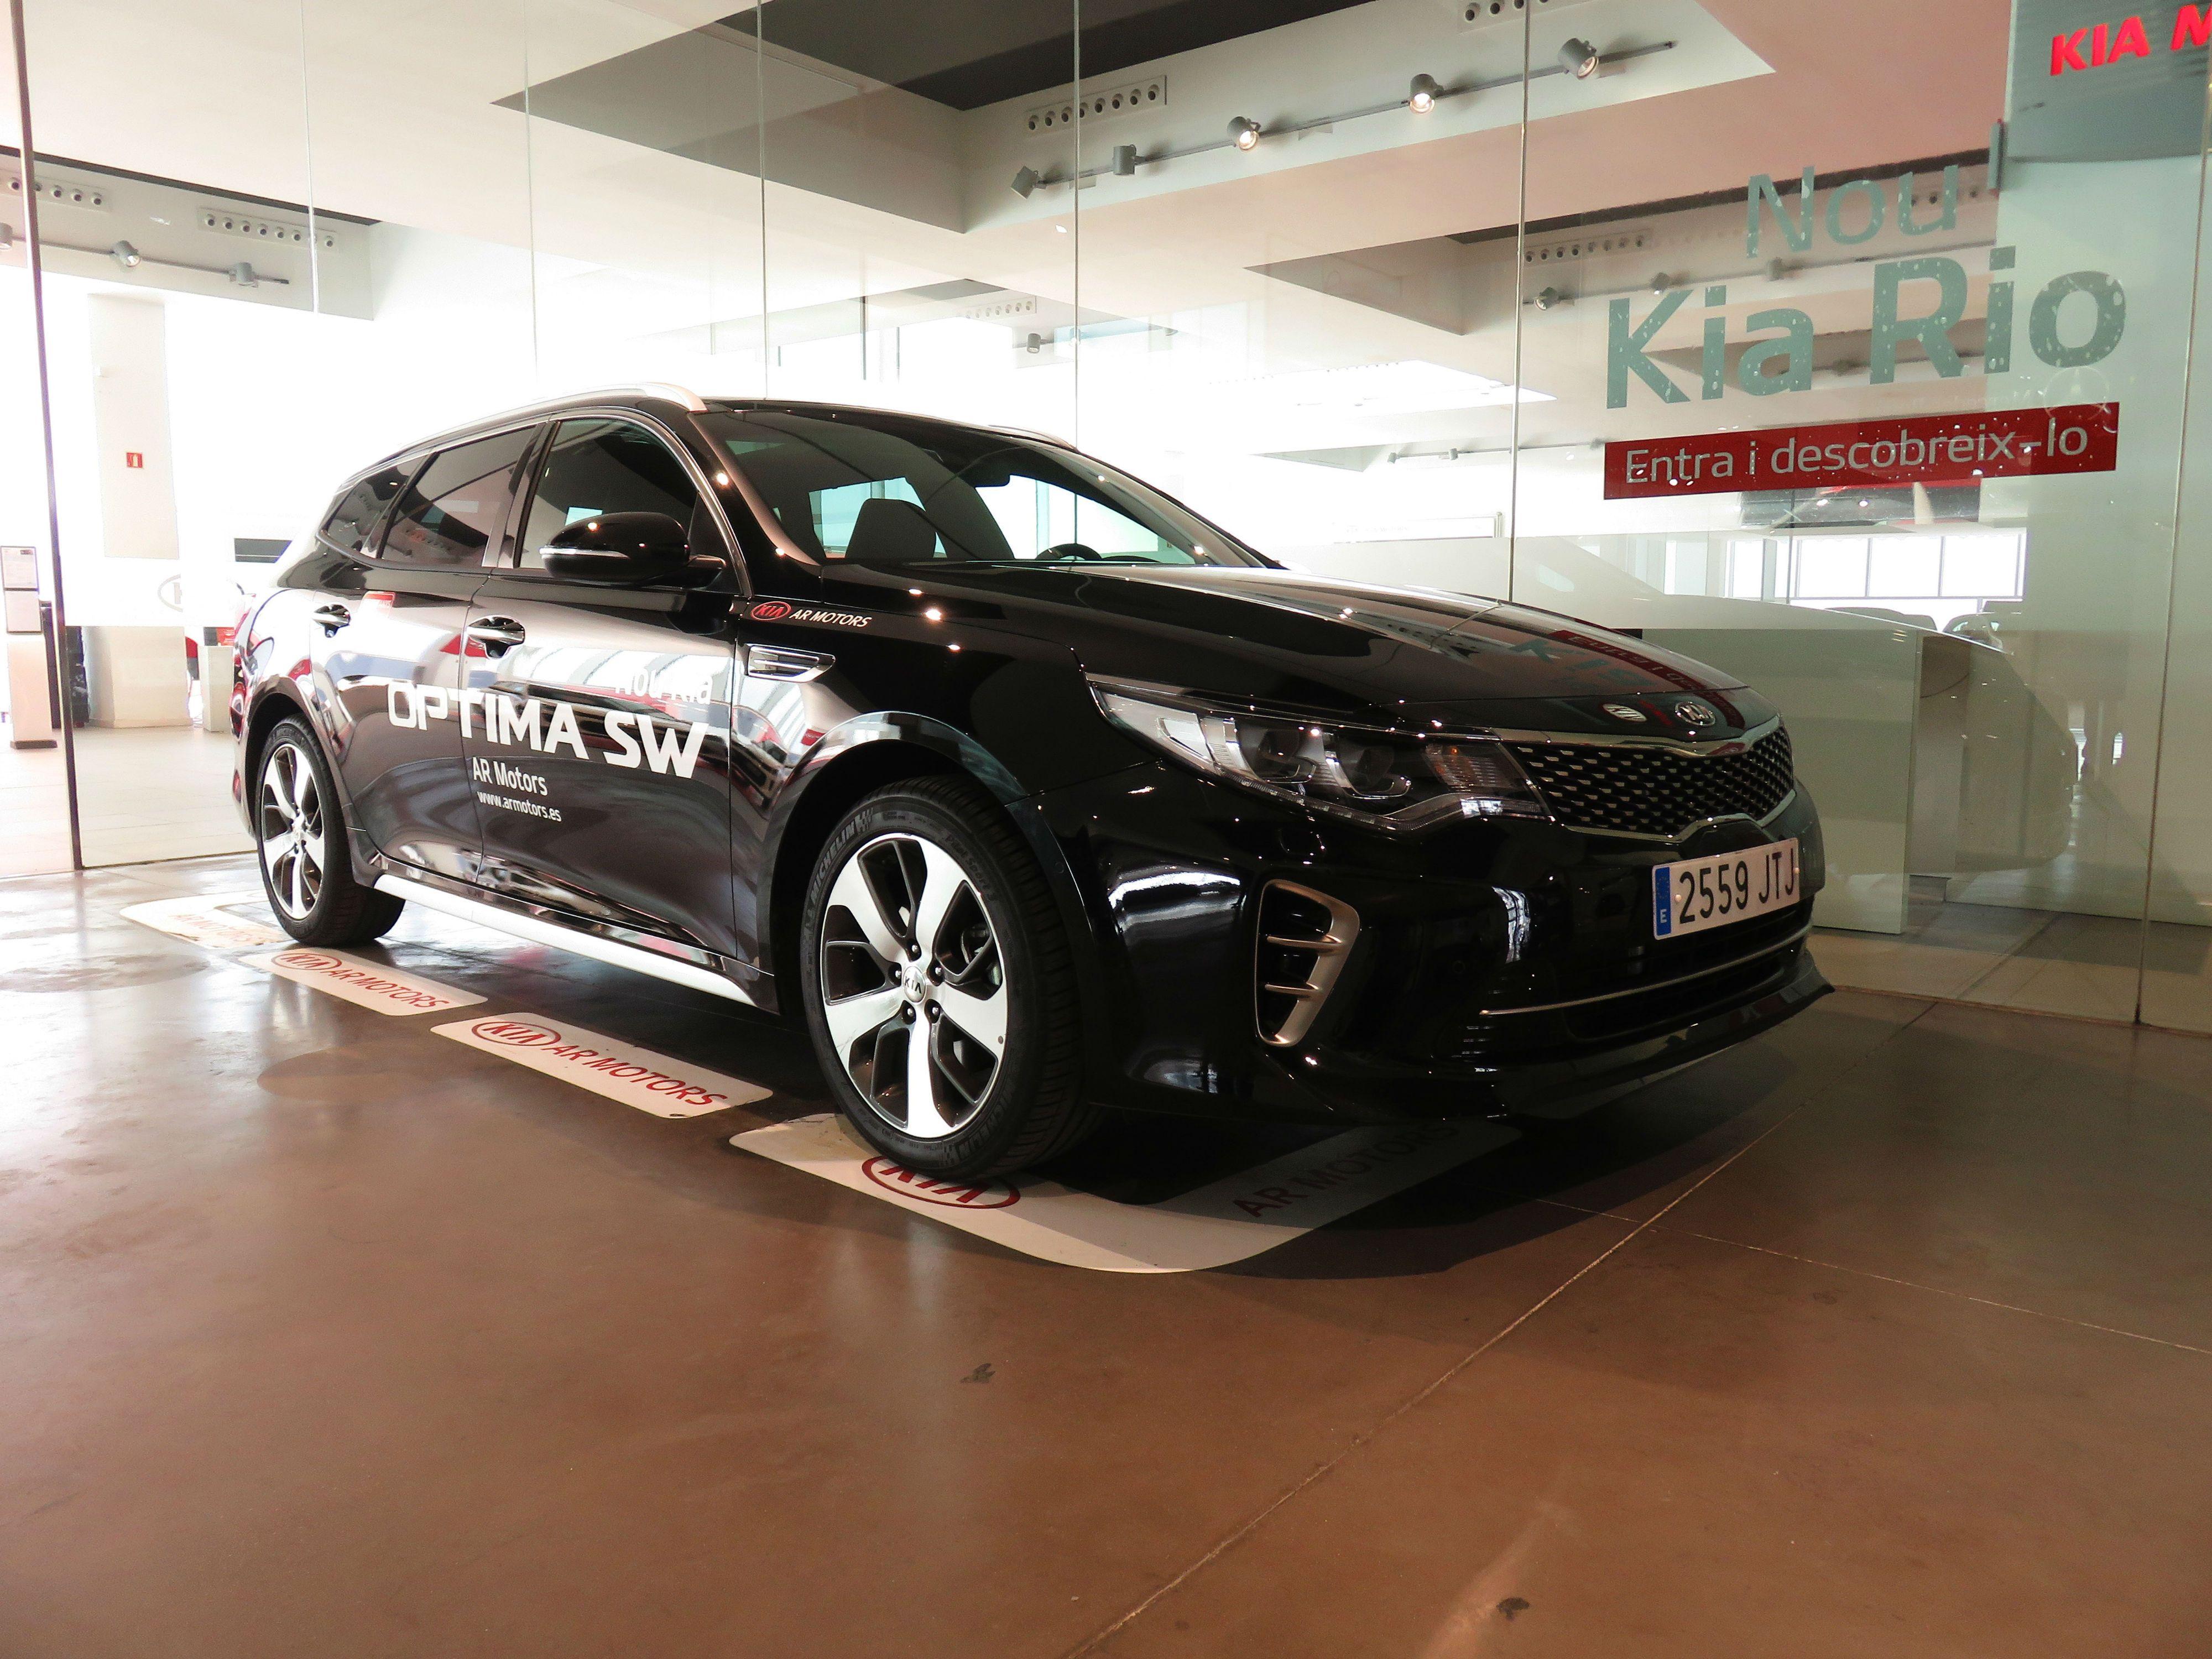 Kia Optima SW 1.7CRDi VGT GT-Line DCT por 31.640€*